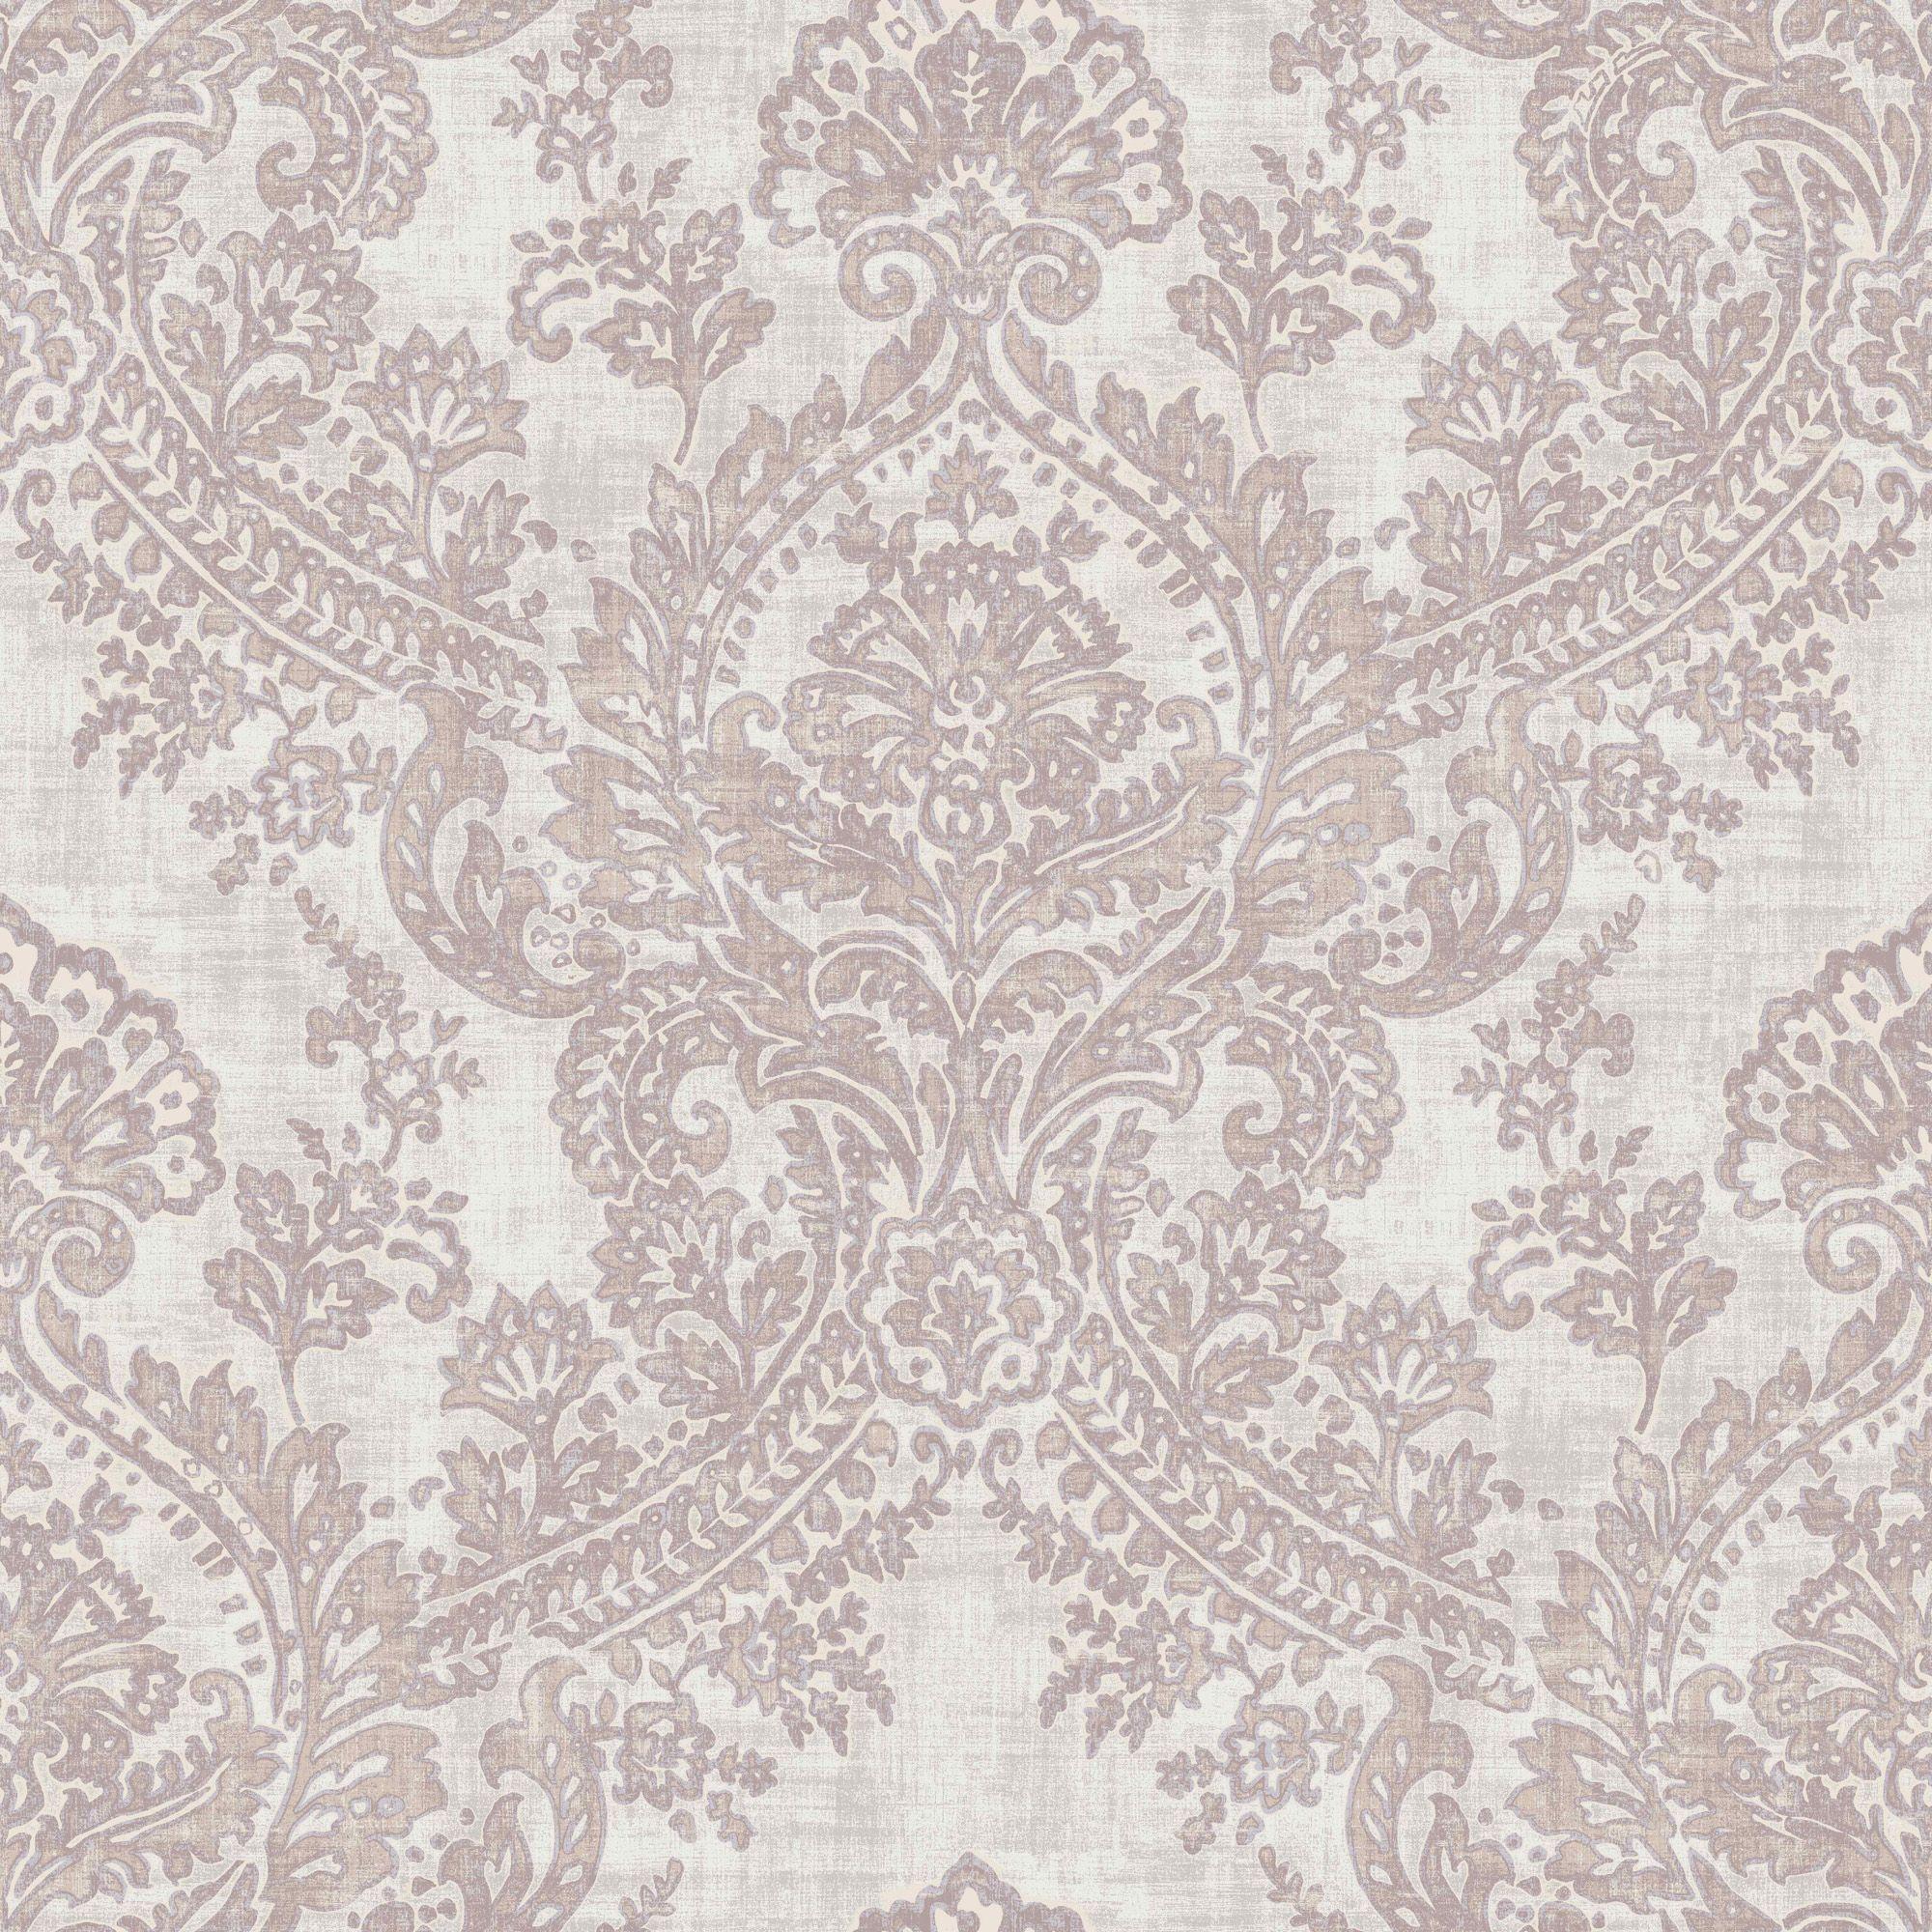 Brown bathroom decorations - Batik Soft Pink Damask Glitter Highlight Wallpaper